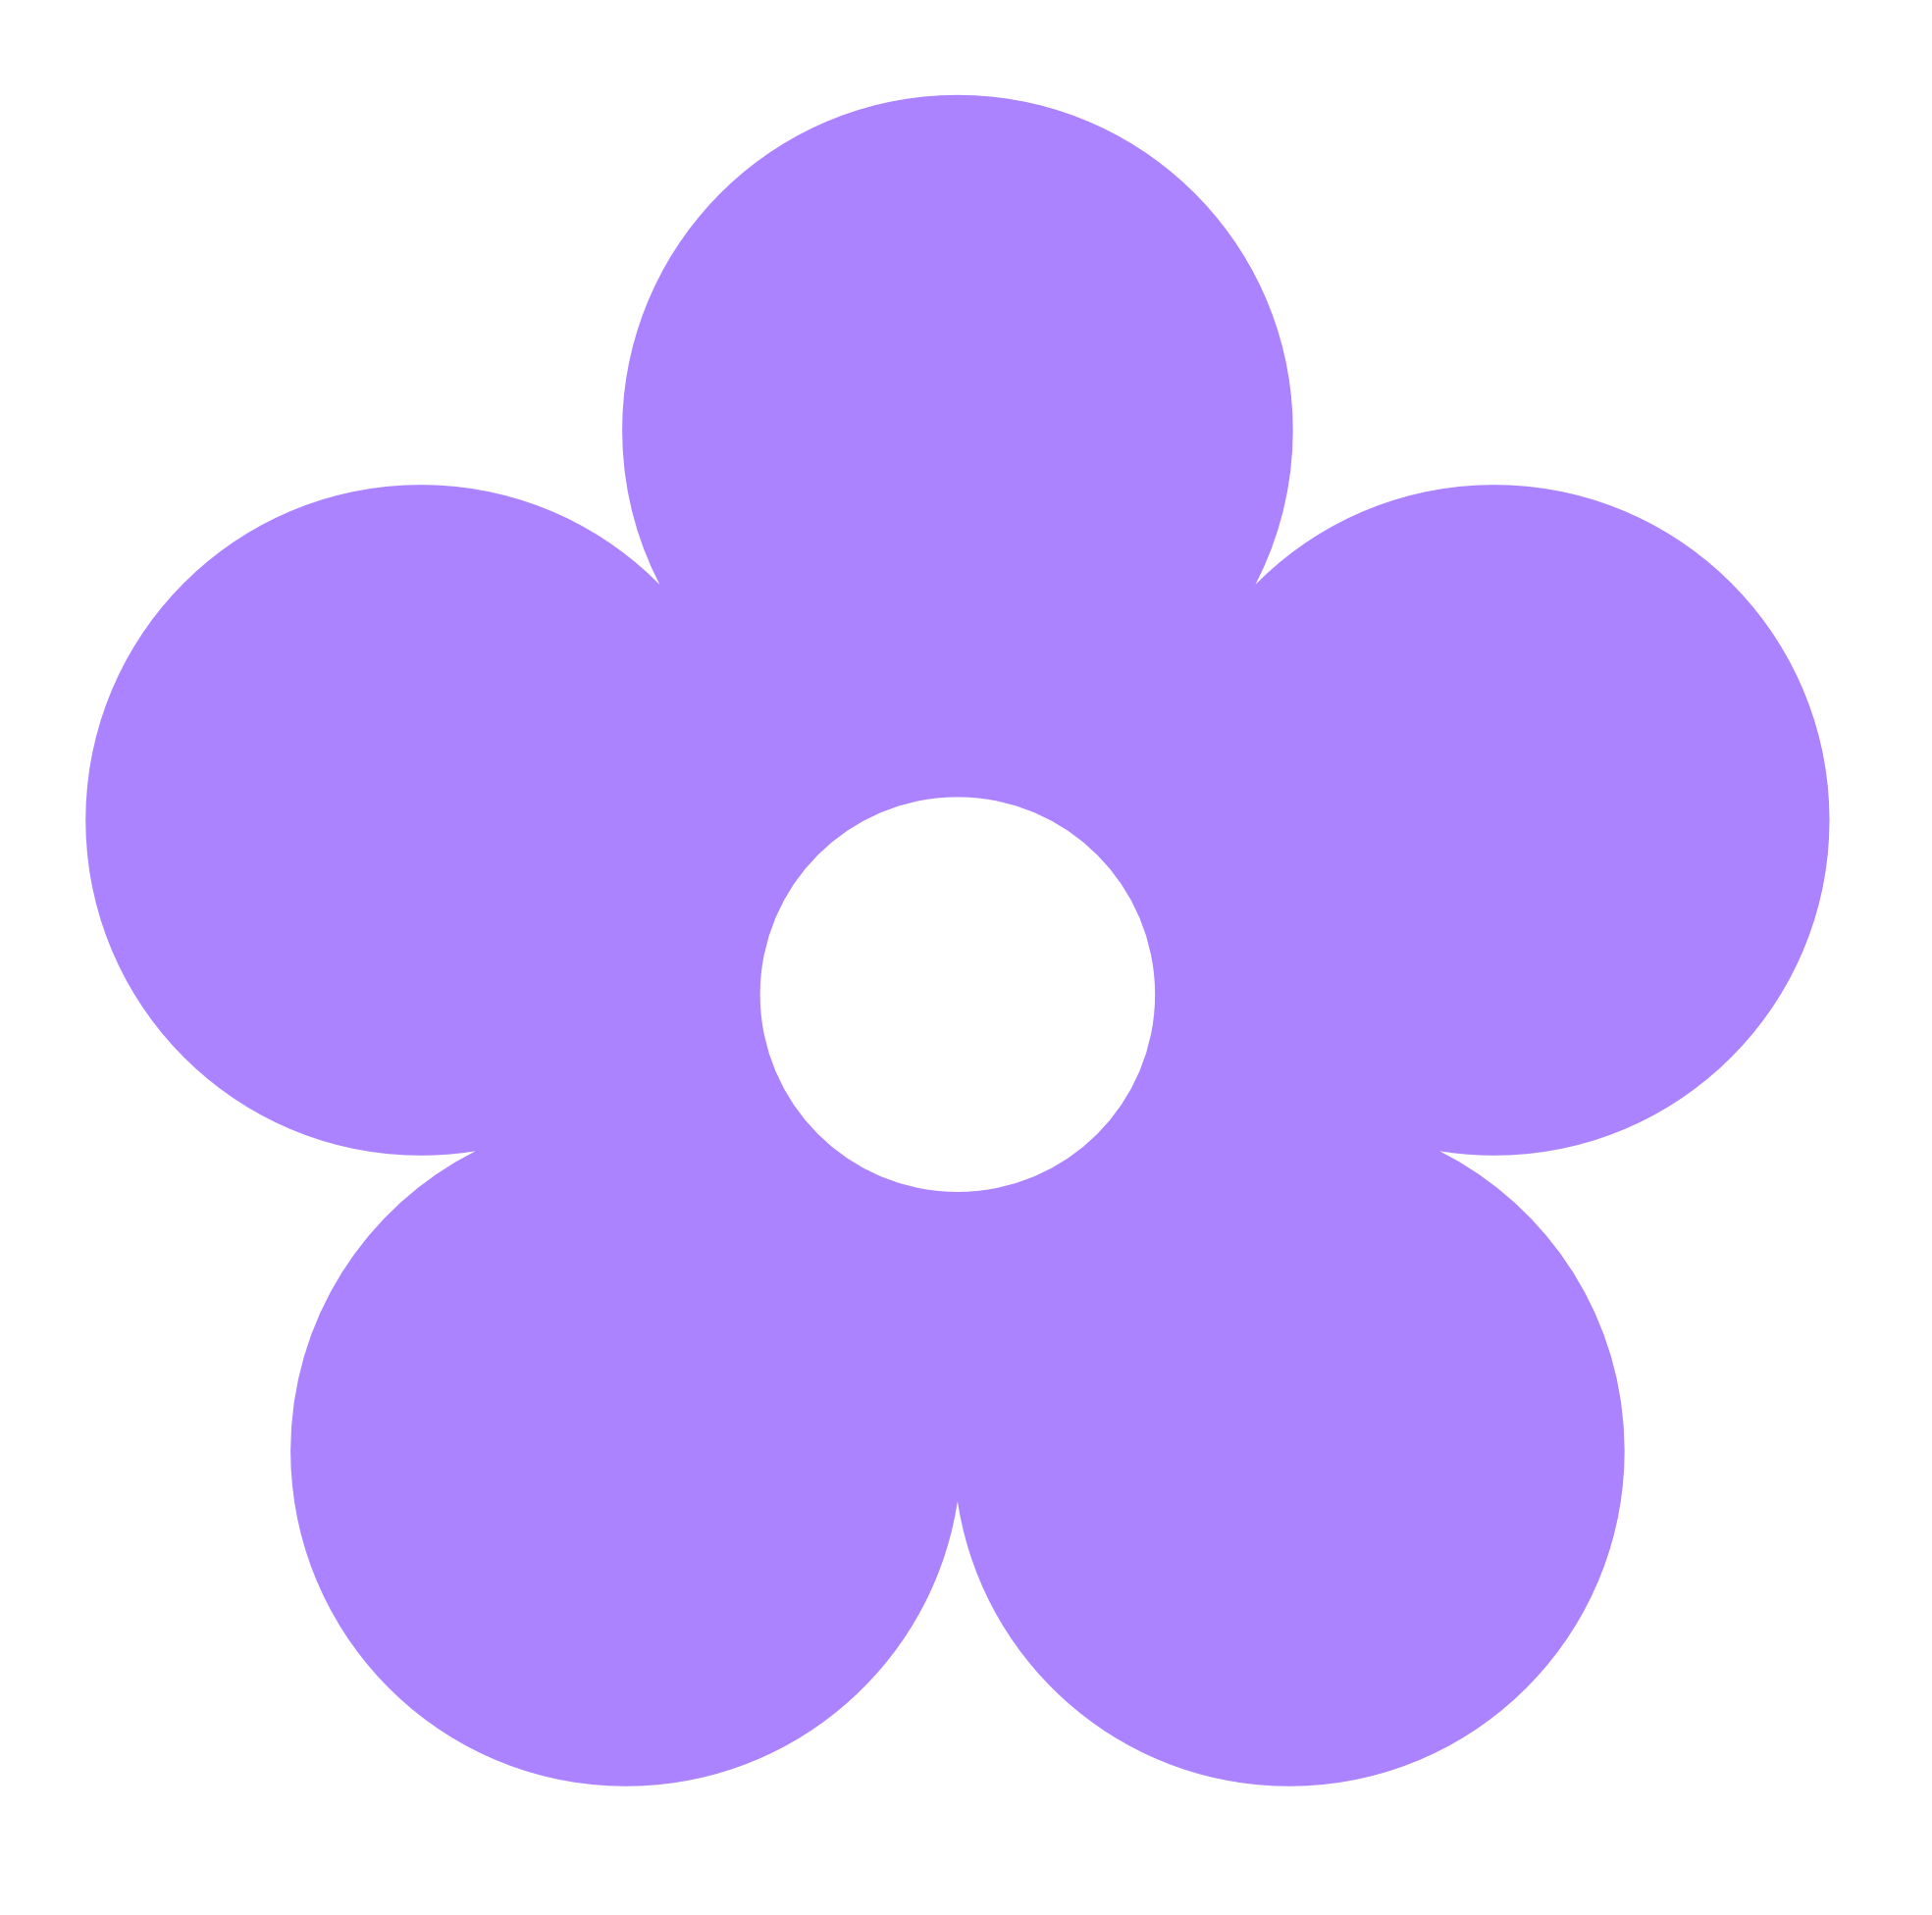 Purple Flower Border Clipart-purple flower border clipart-7